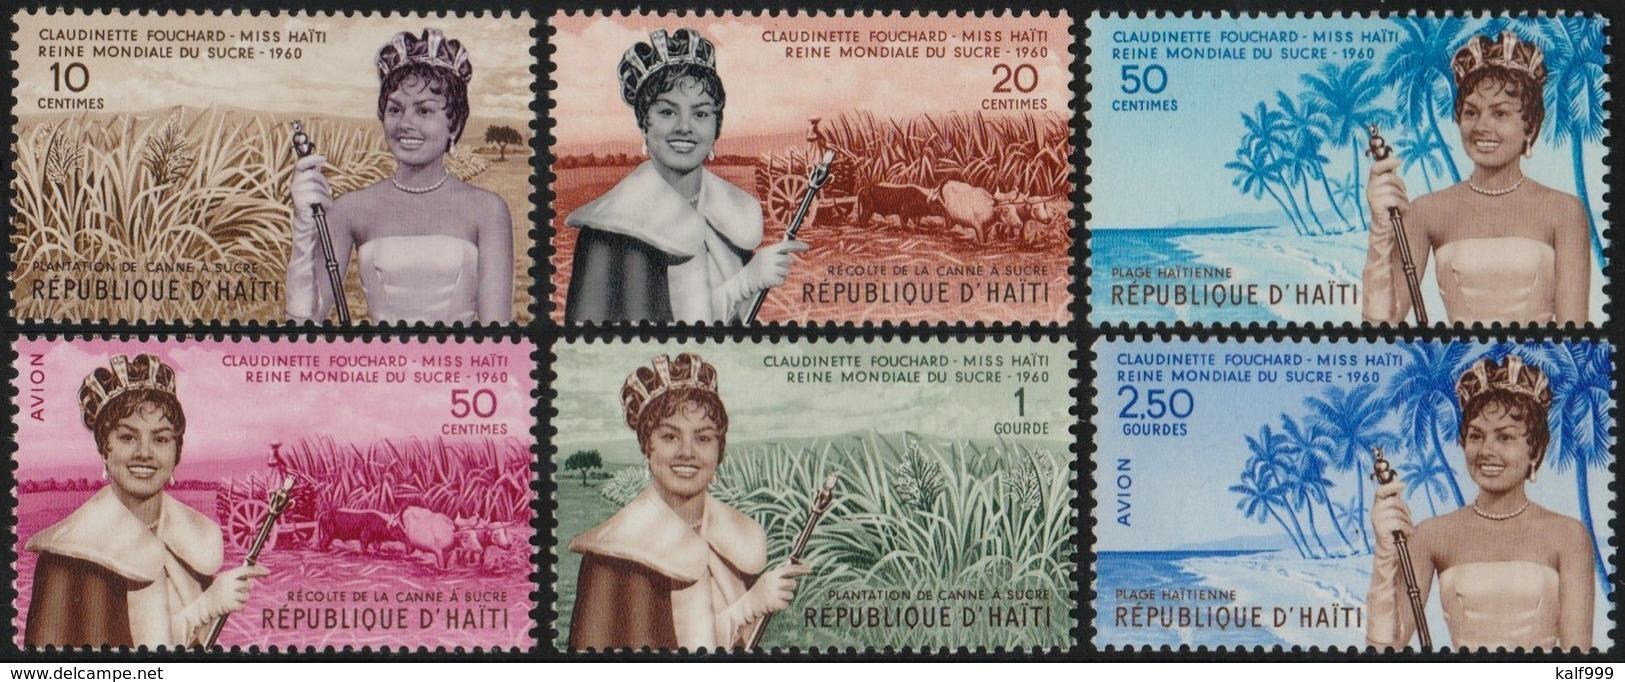 ~~~ Haiti 1960 - Miss Haiti Fouchard  - Mi. 615/620 ** MNH  Depart 1 Euro ~~~ - Haití